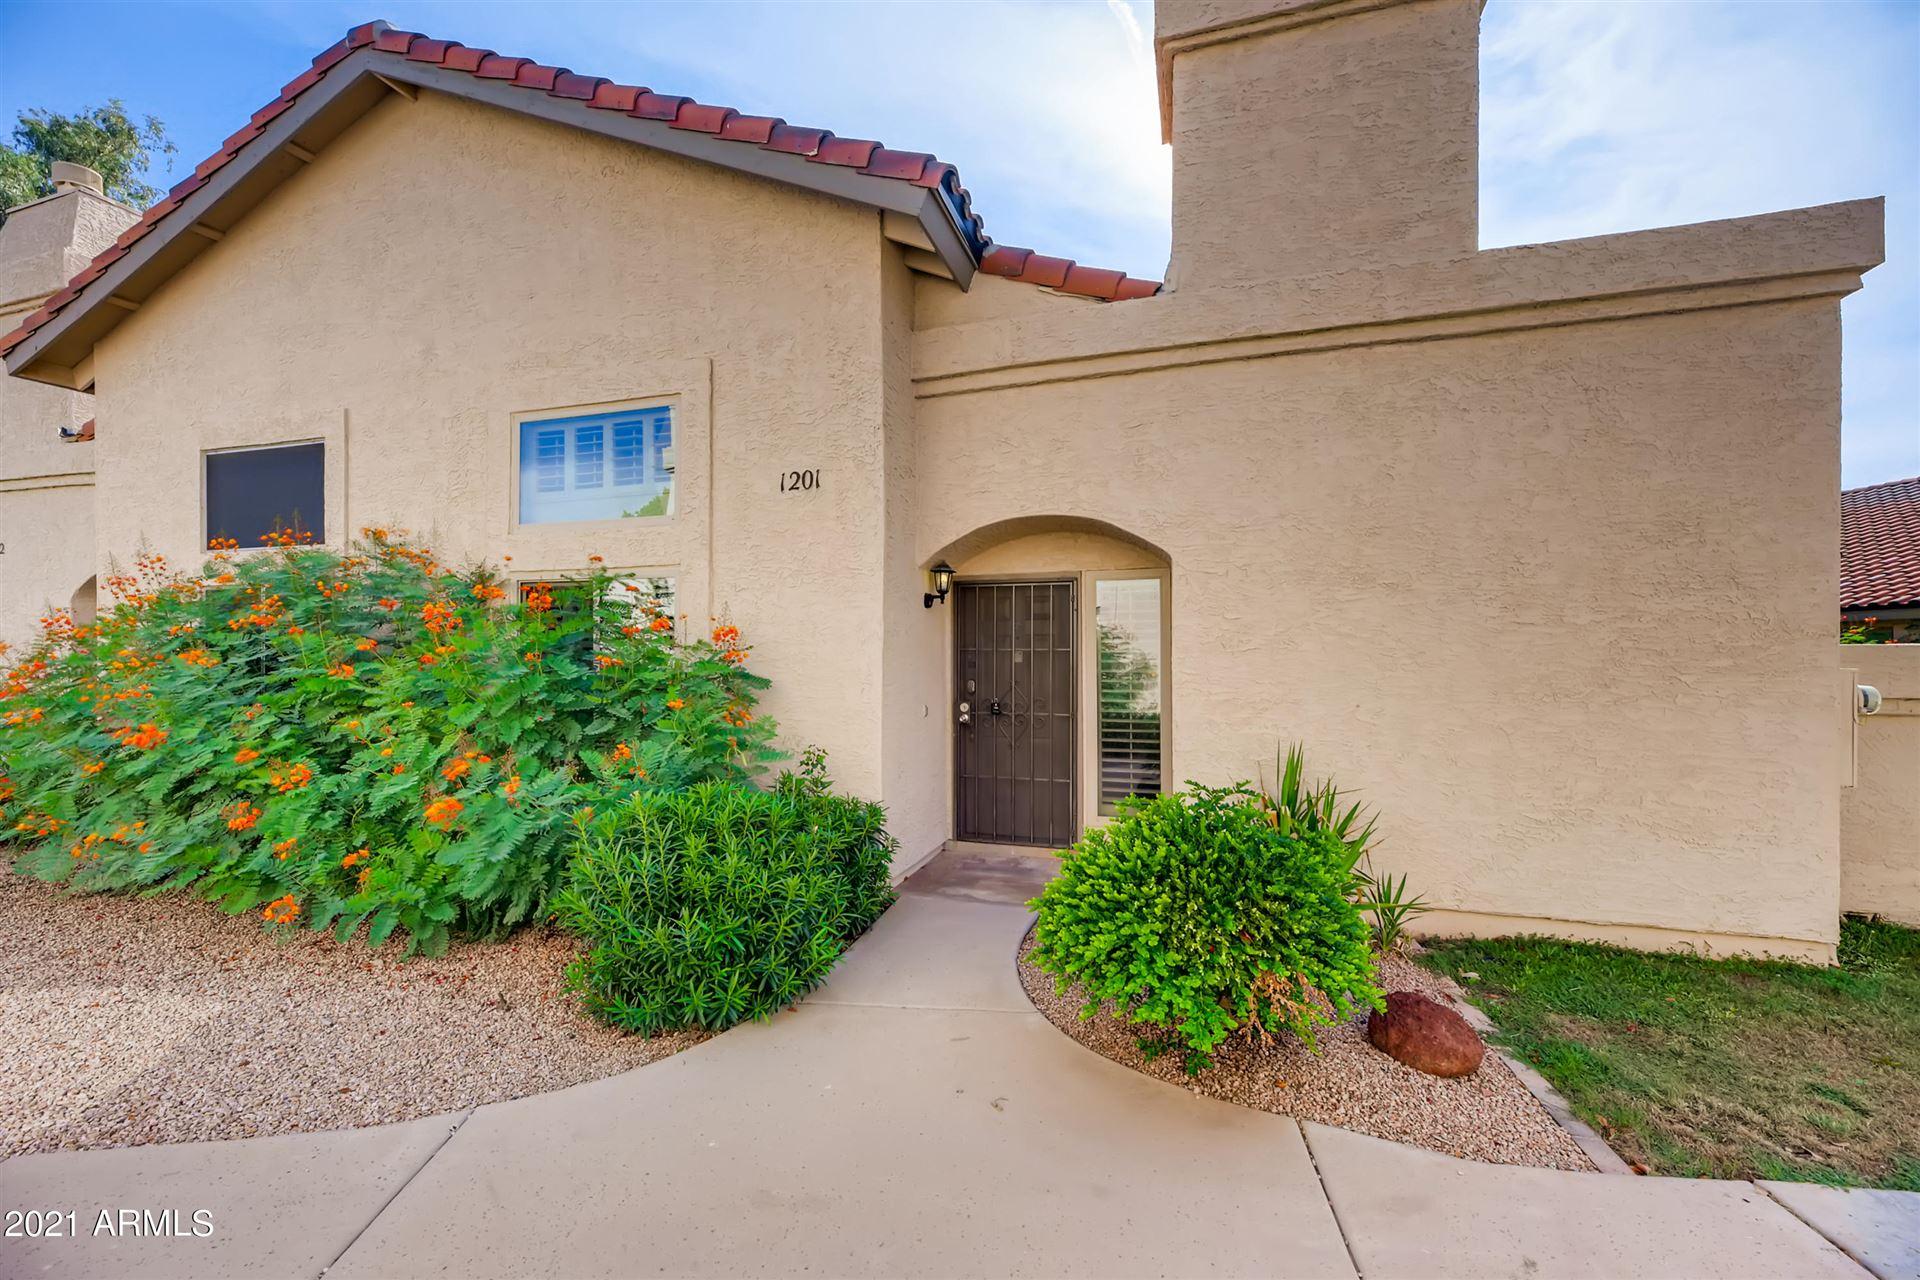 2019 W LEMON TREE Place #1201, Chandler, AZ 85224 - MLS#: 6270241